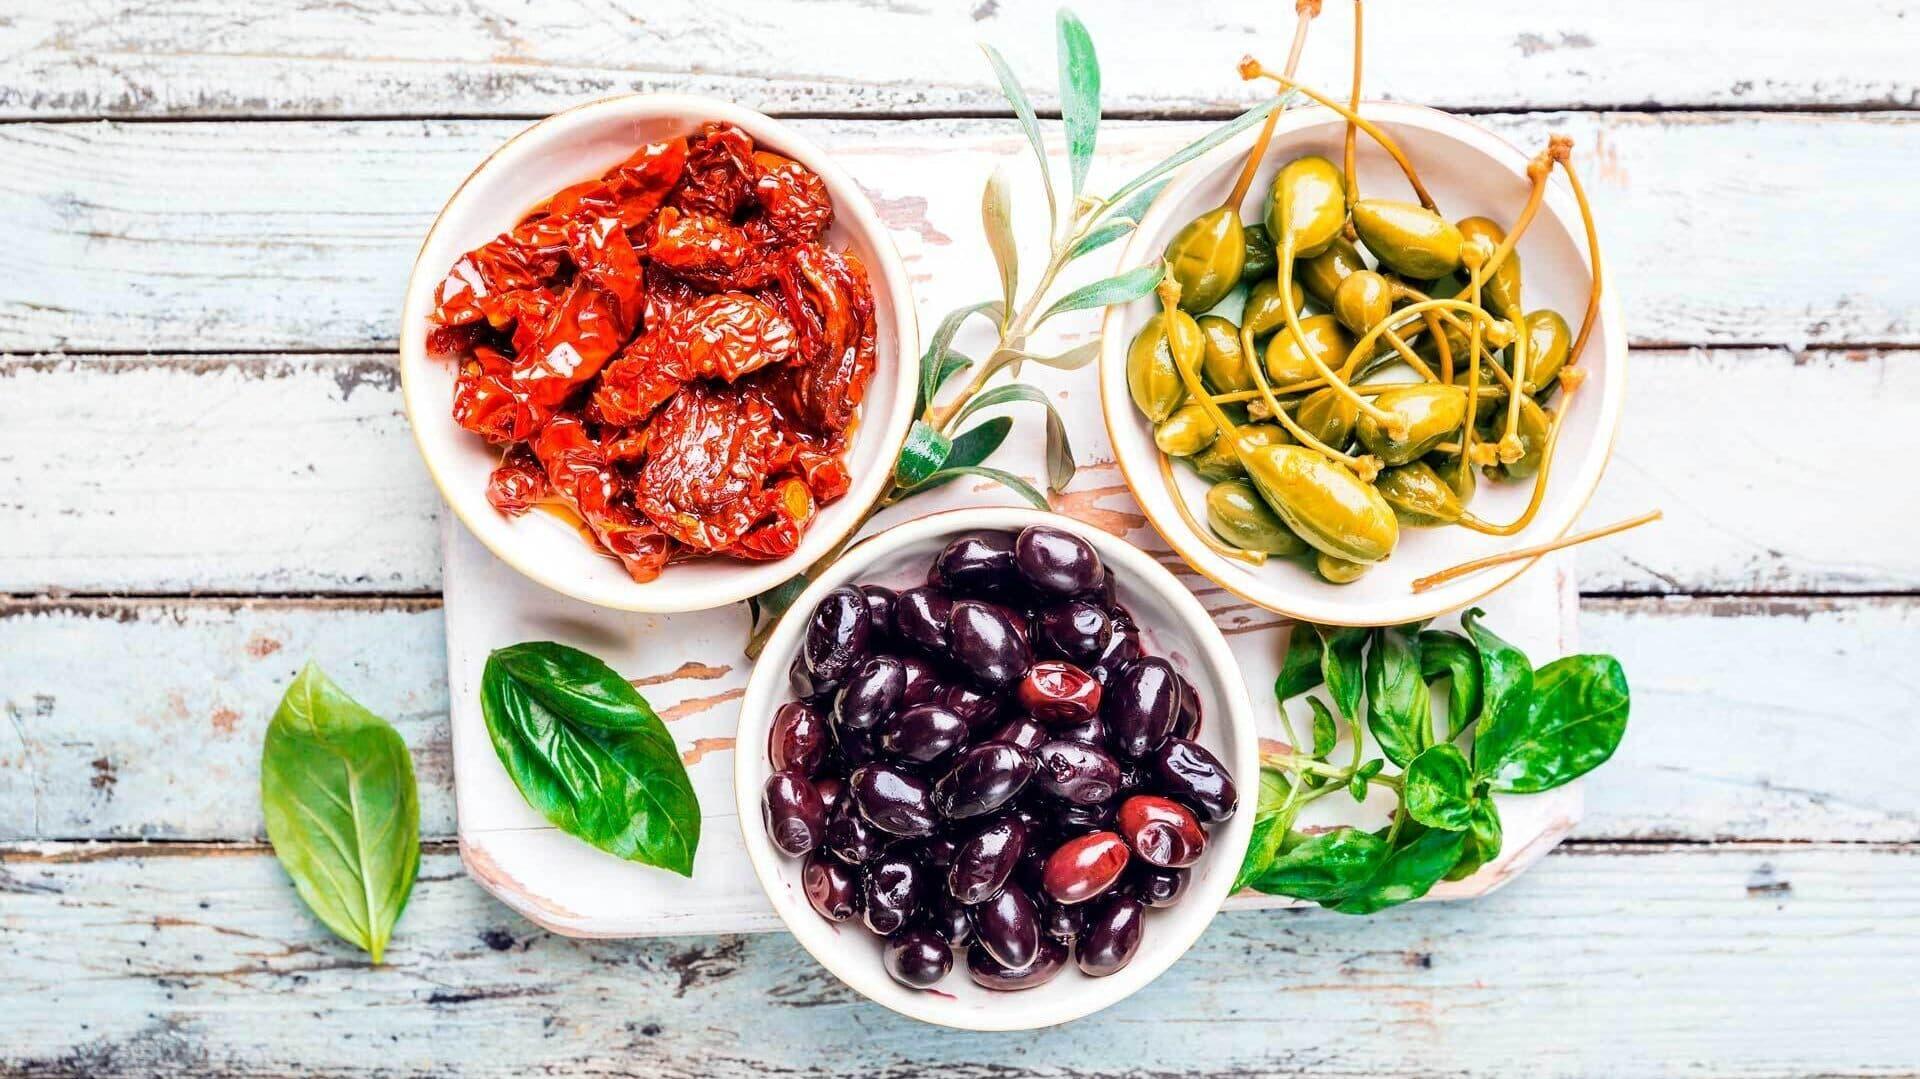 Antipasti: Getrocknete Tomaten, Oliven und Kapern